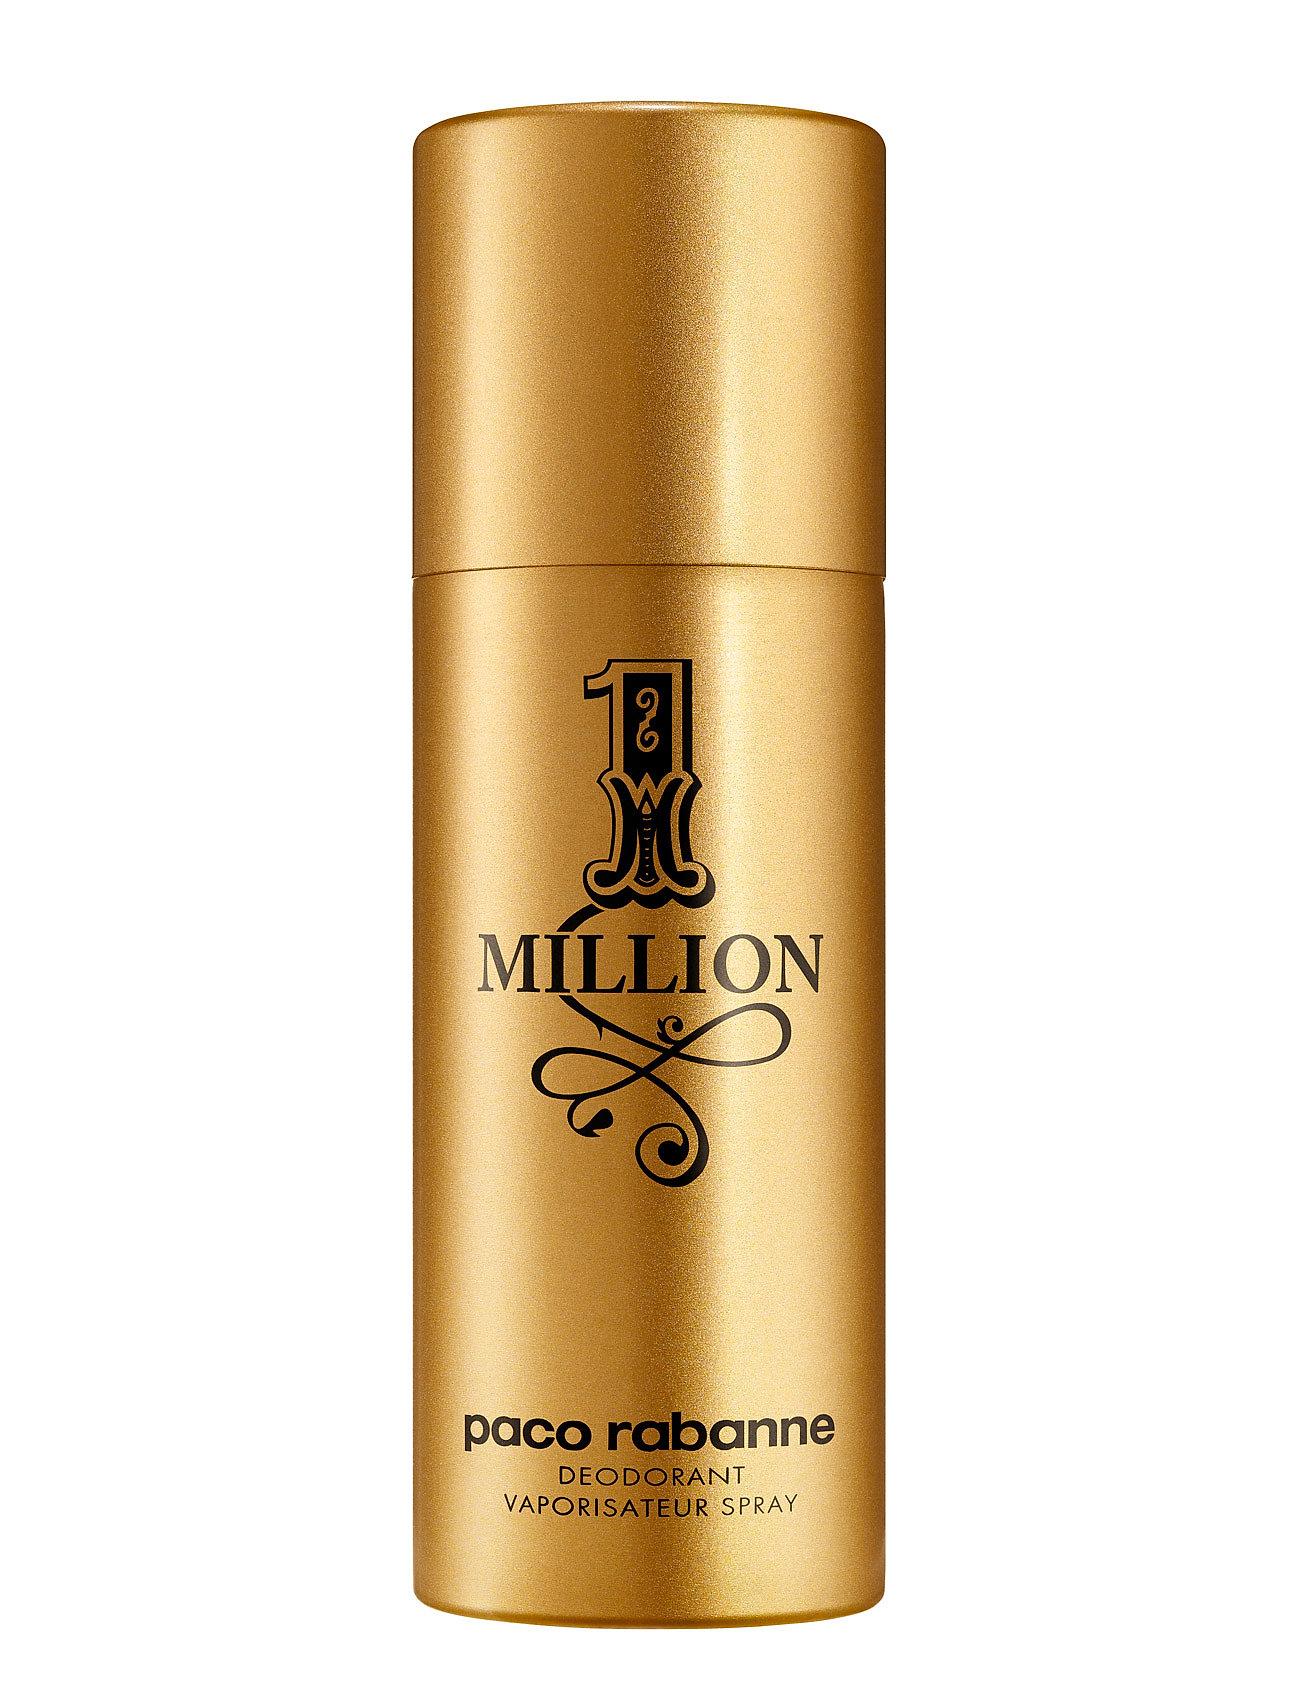 paco rabanne Paco rabanne one million deodorant fra boozt.com dk